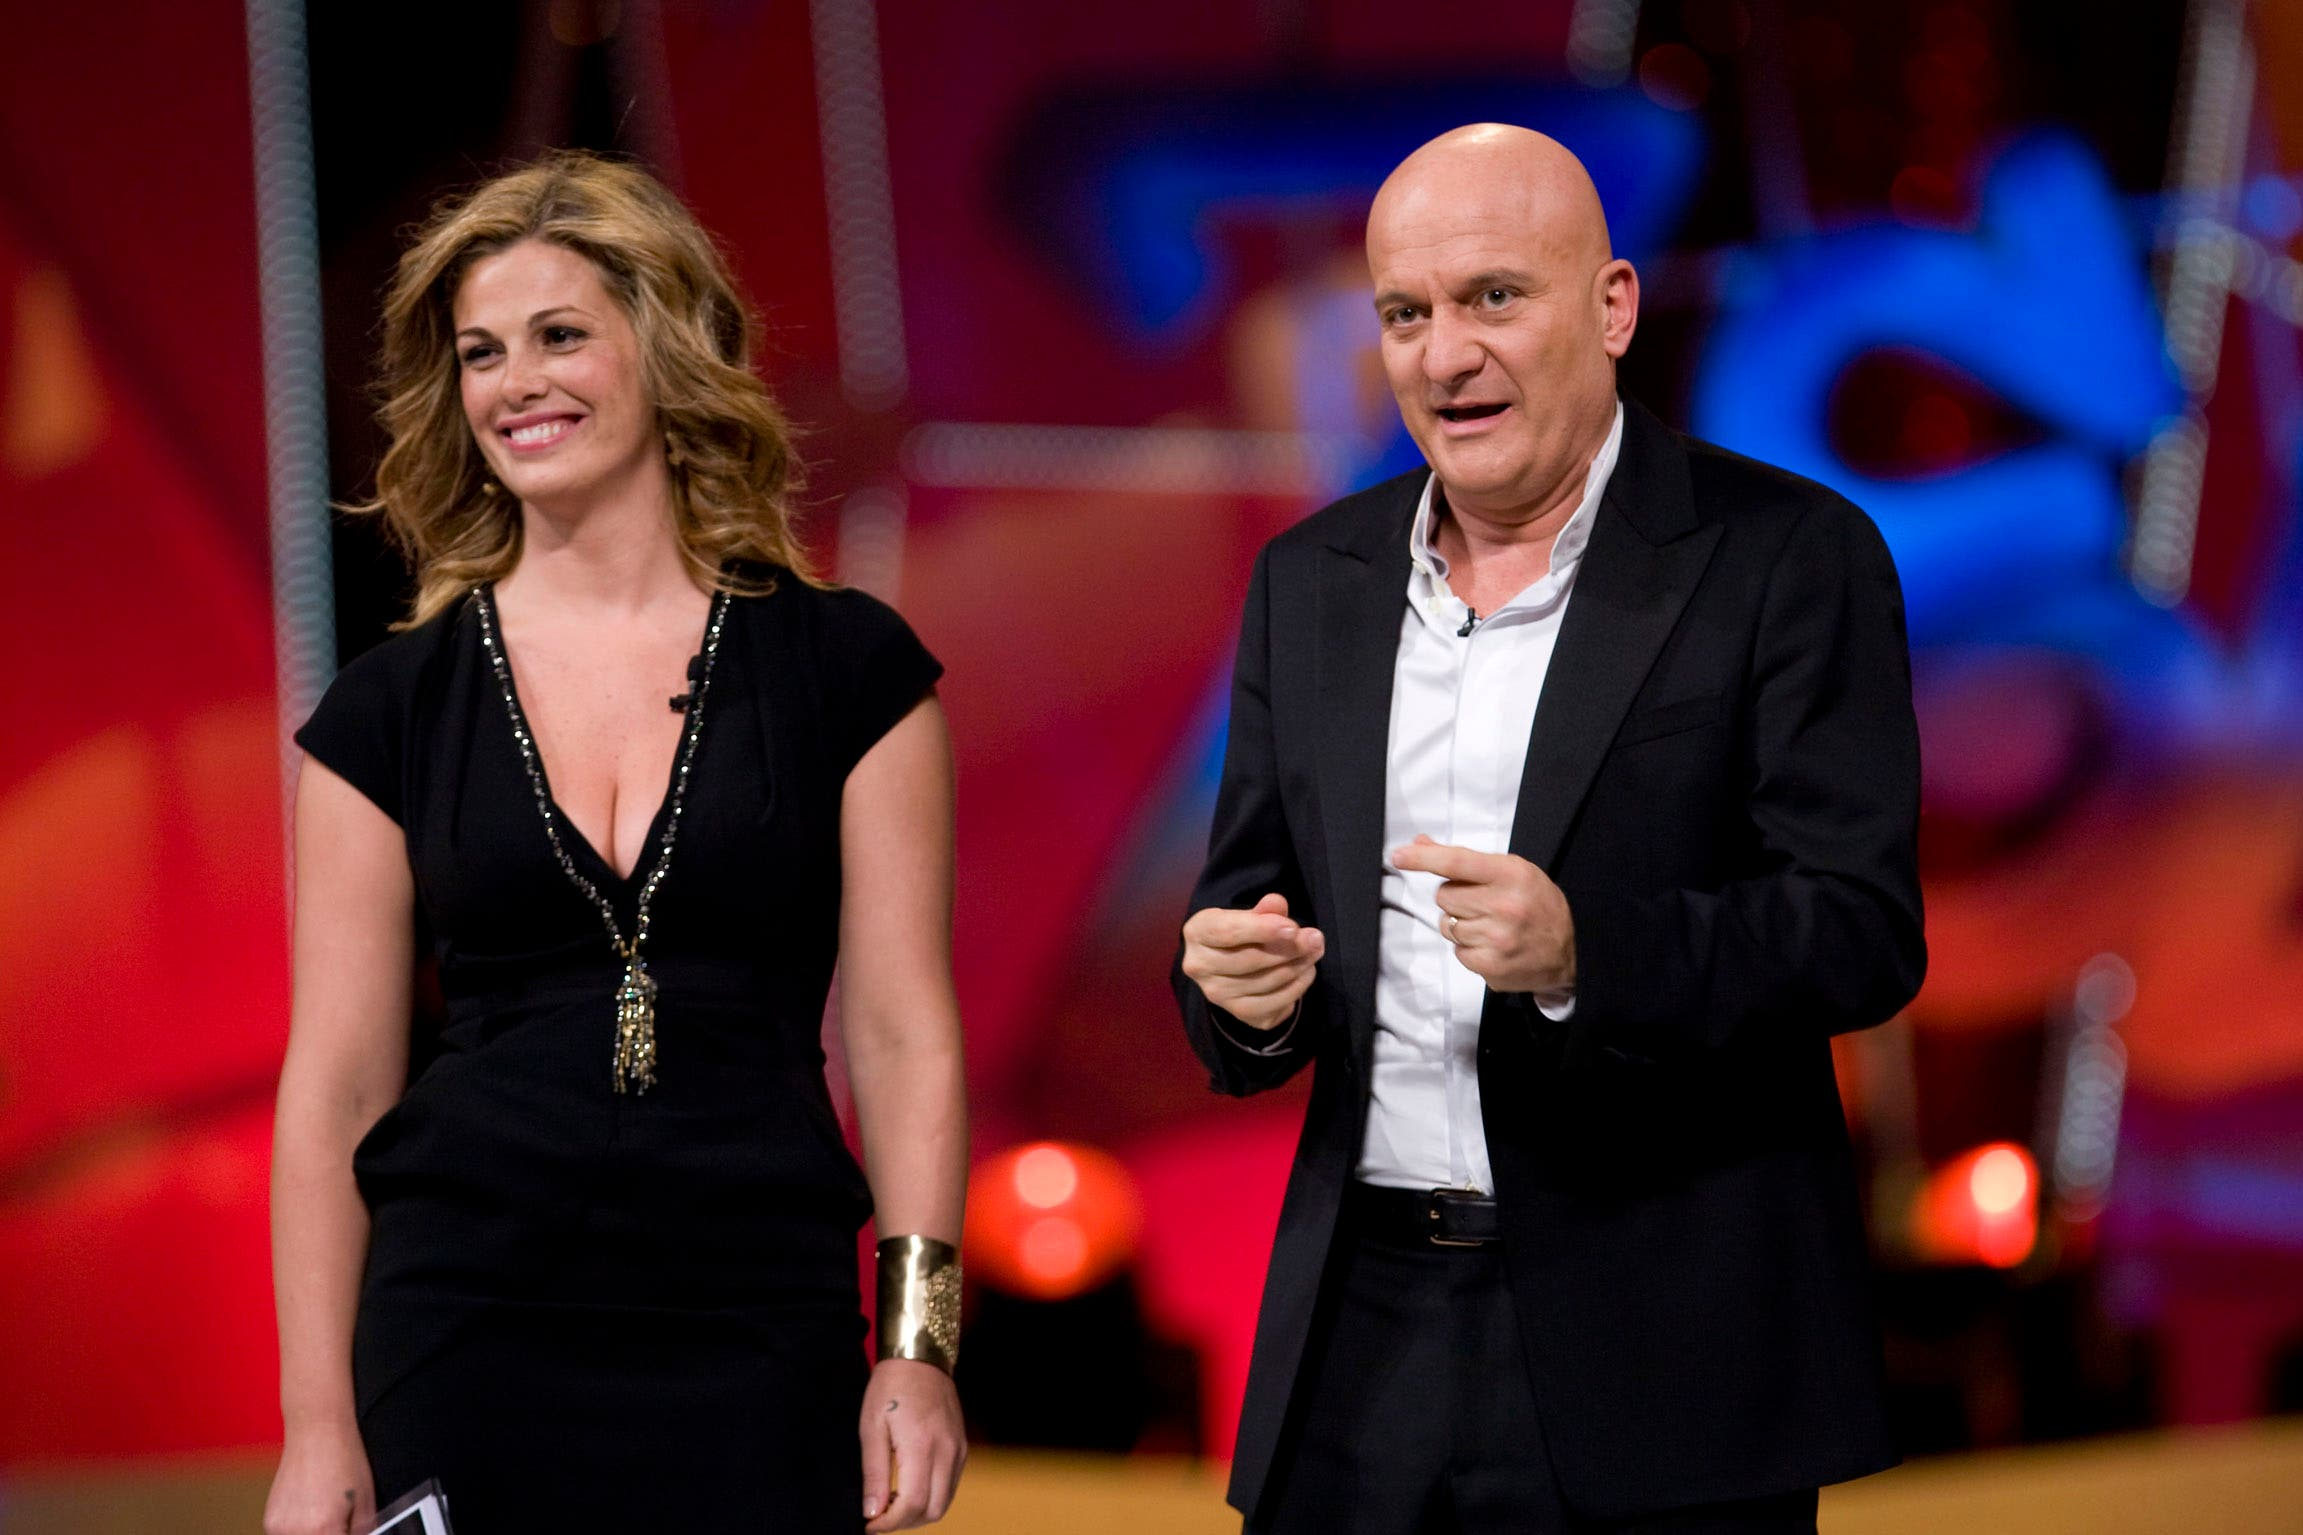 ZELIG, LA MACCHINA PERFETTA Zelig, Claudio Bisio e Vanessa Incontrada – DavideMaggio.it